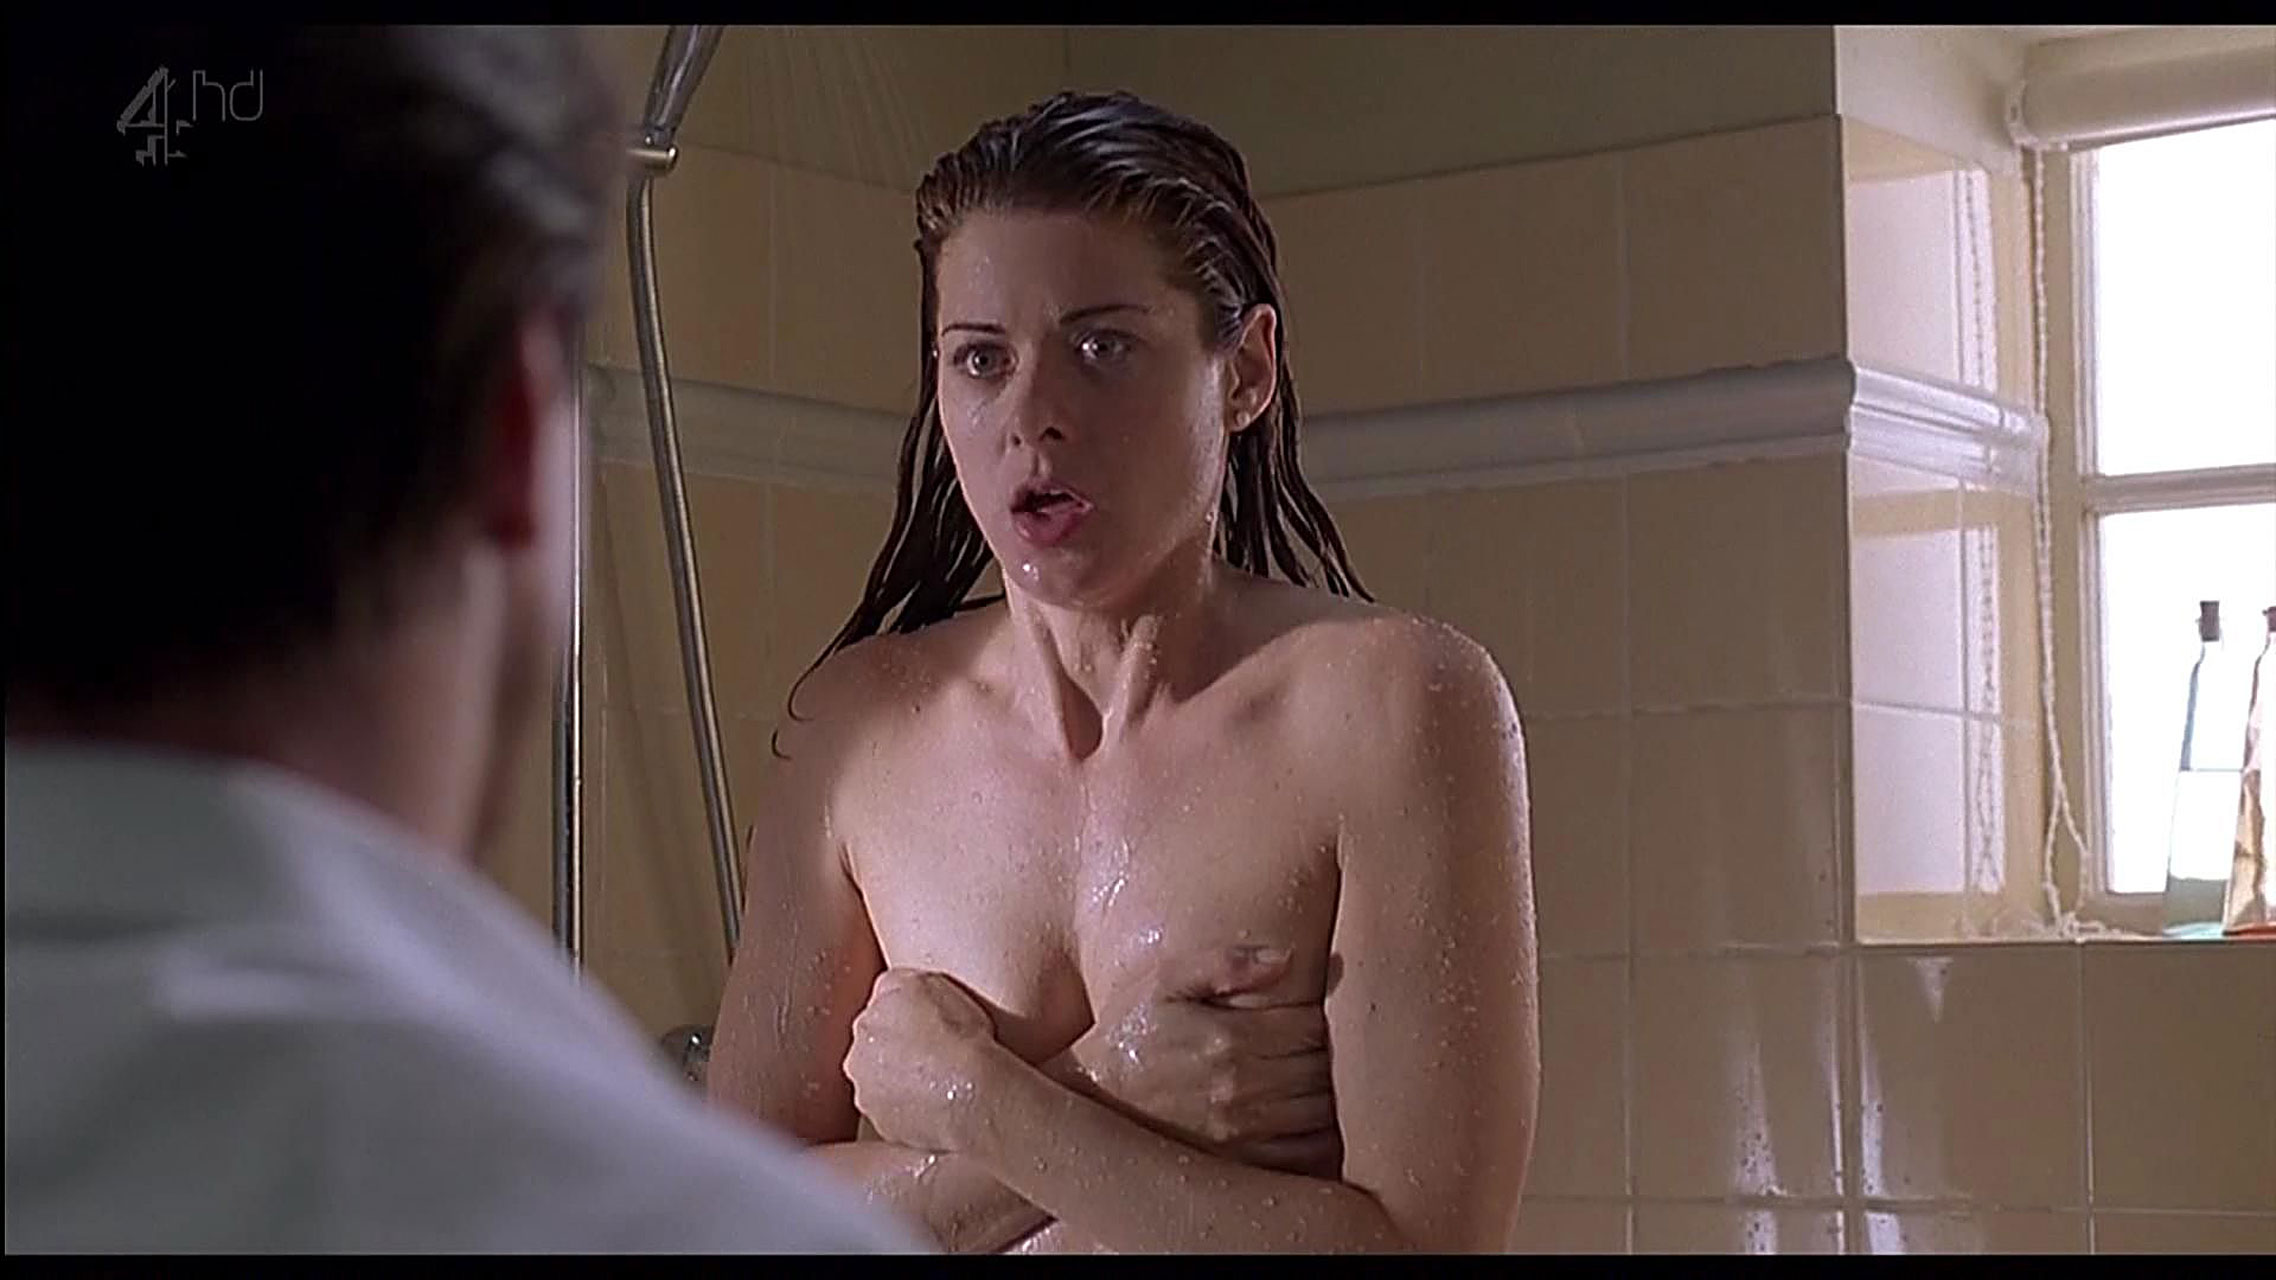 Alyson Hannigan Sex Tape alyson hannigan nude sex tape - megapornx